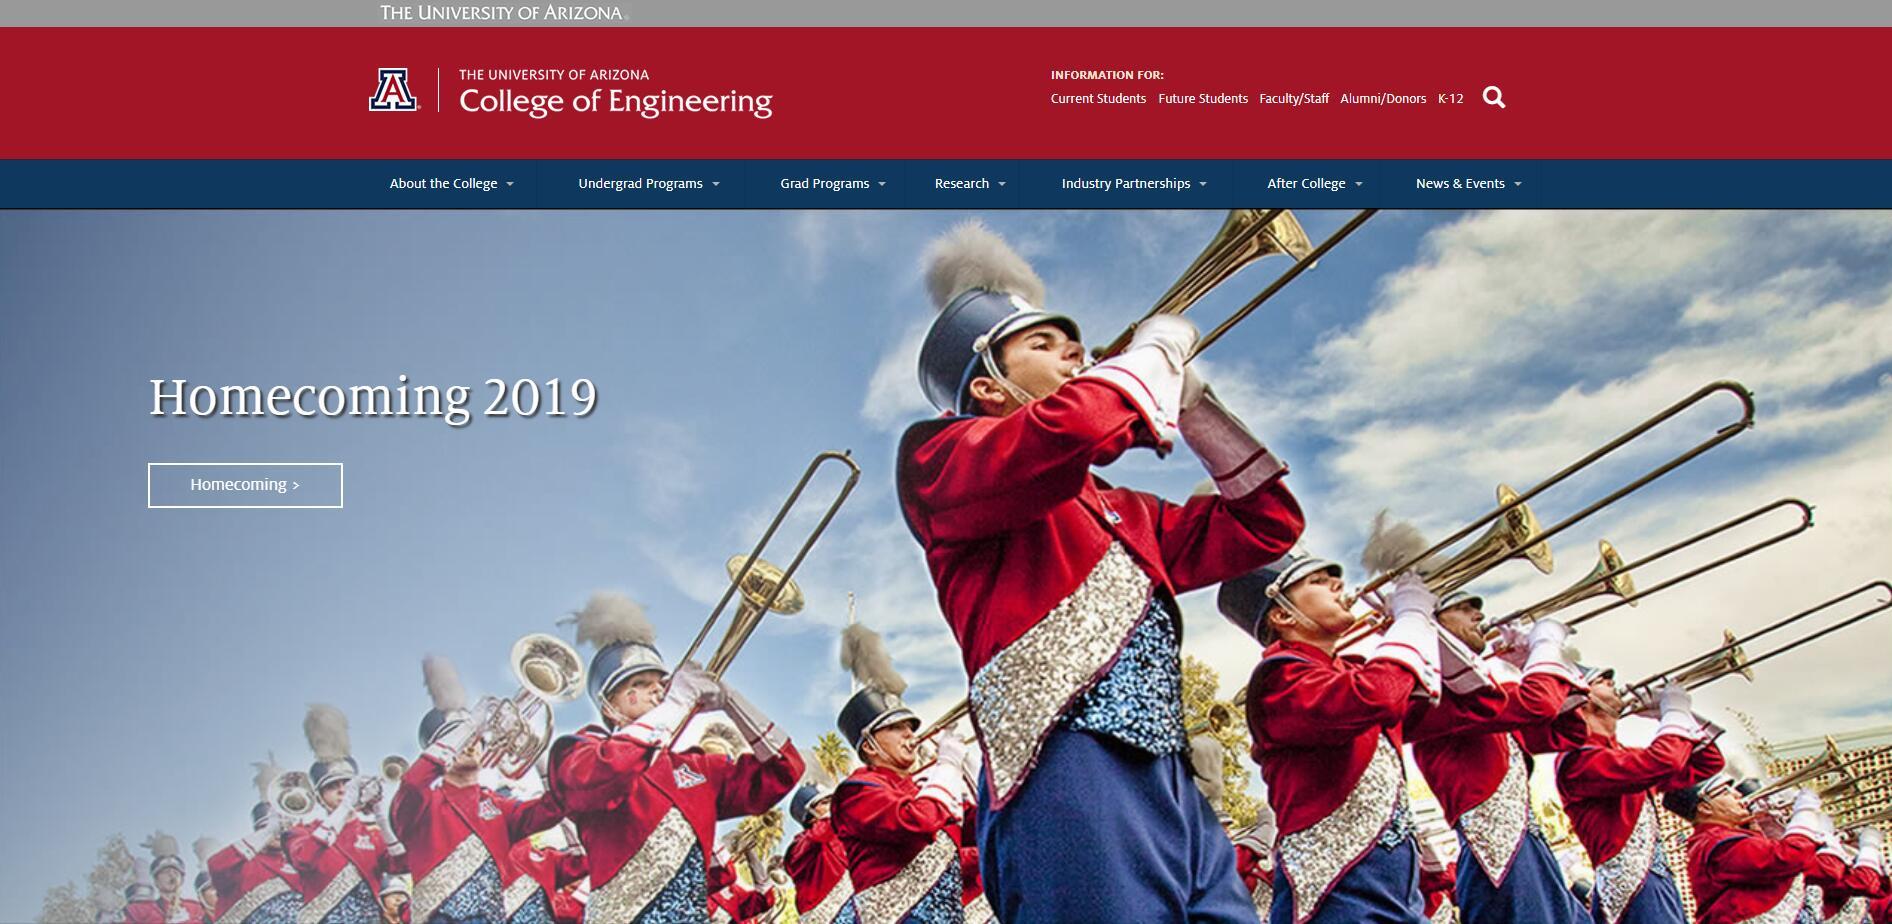 The College of Engineering at University of Arizona